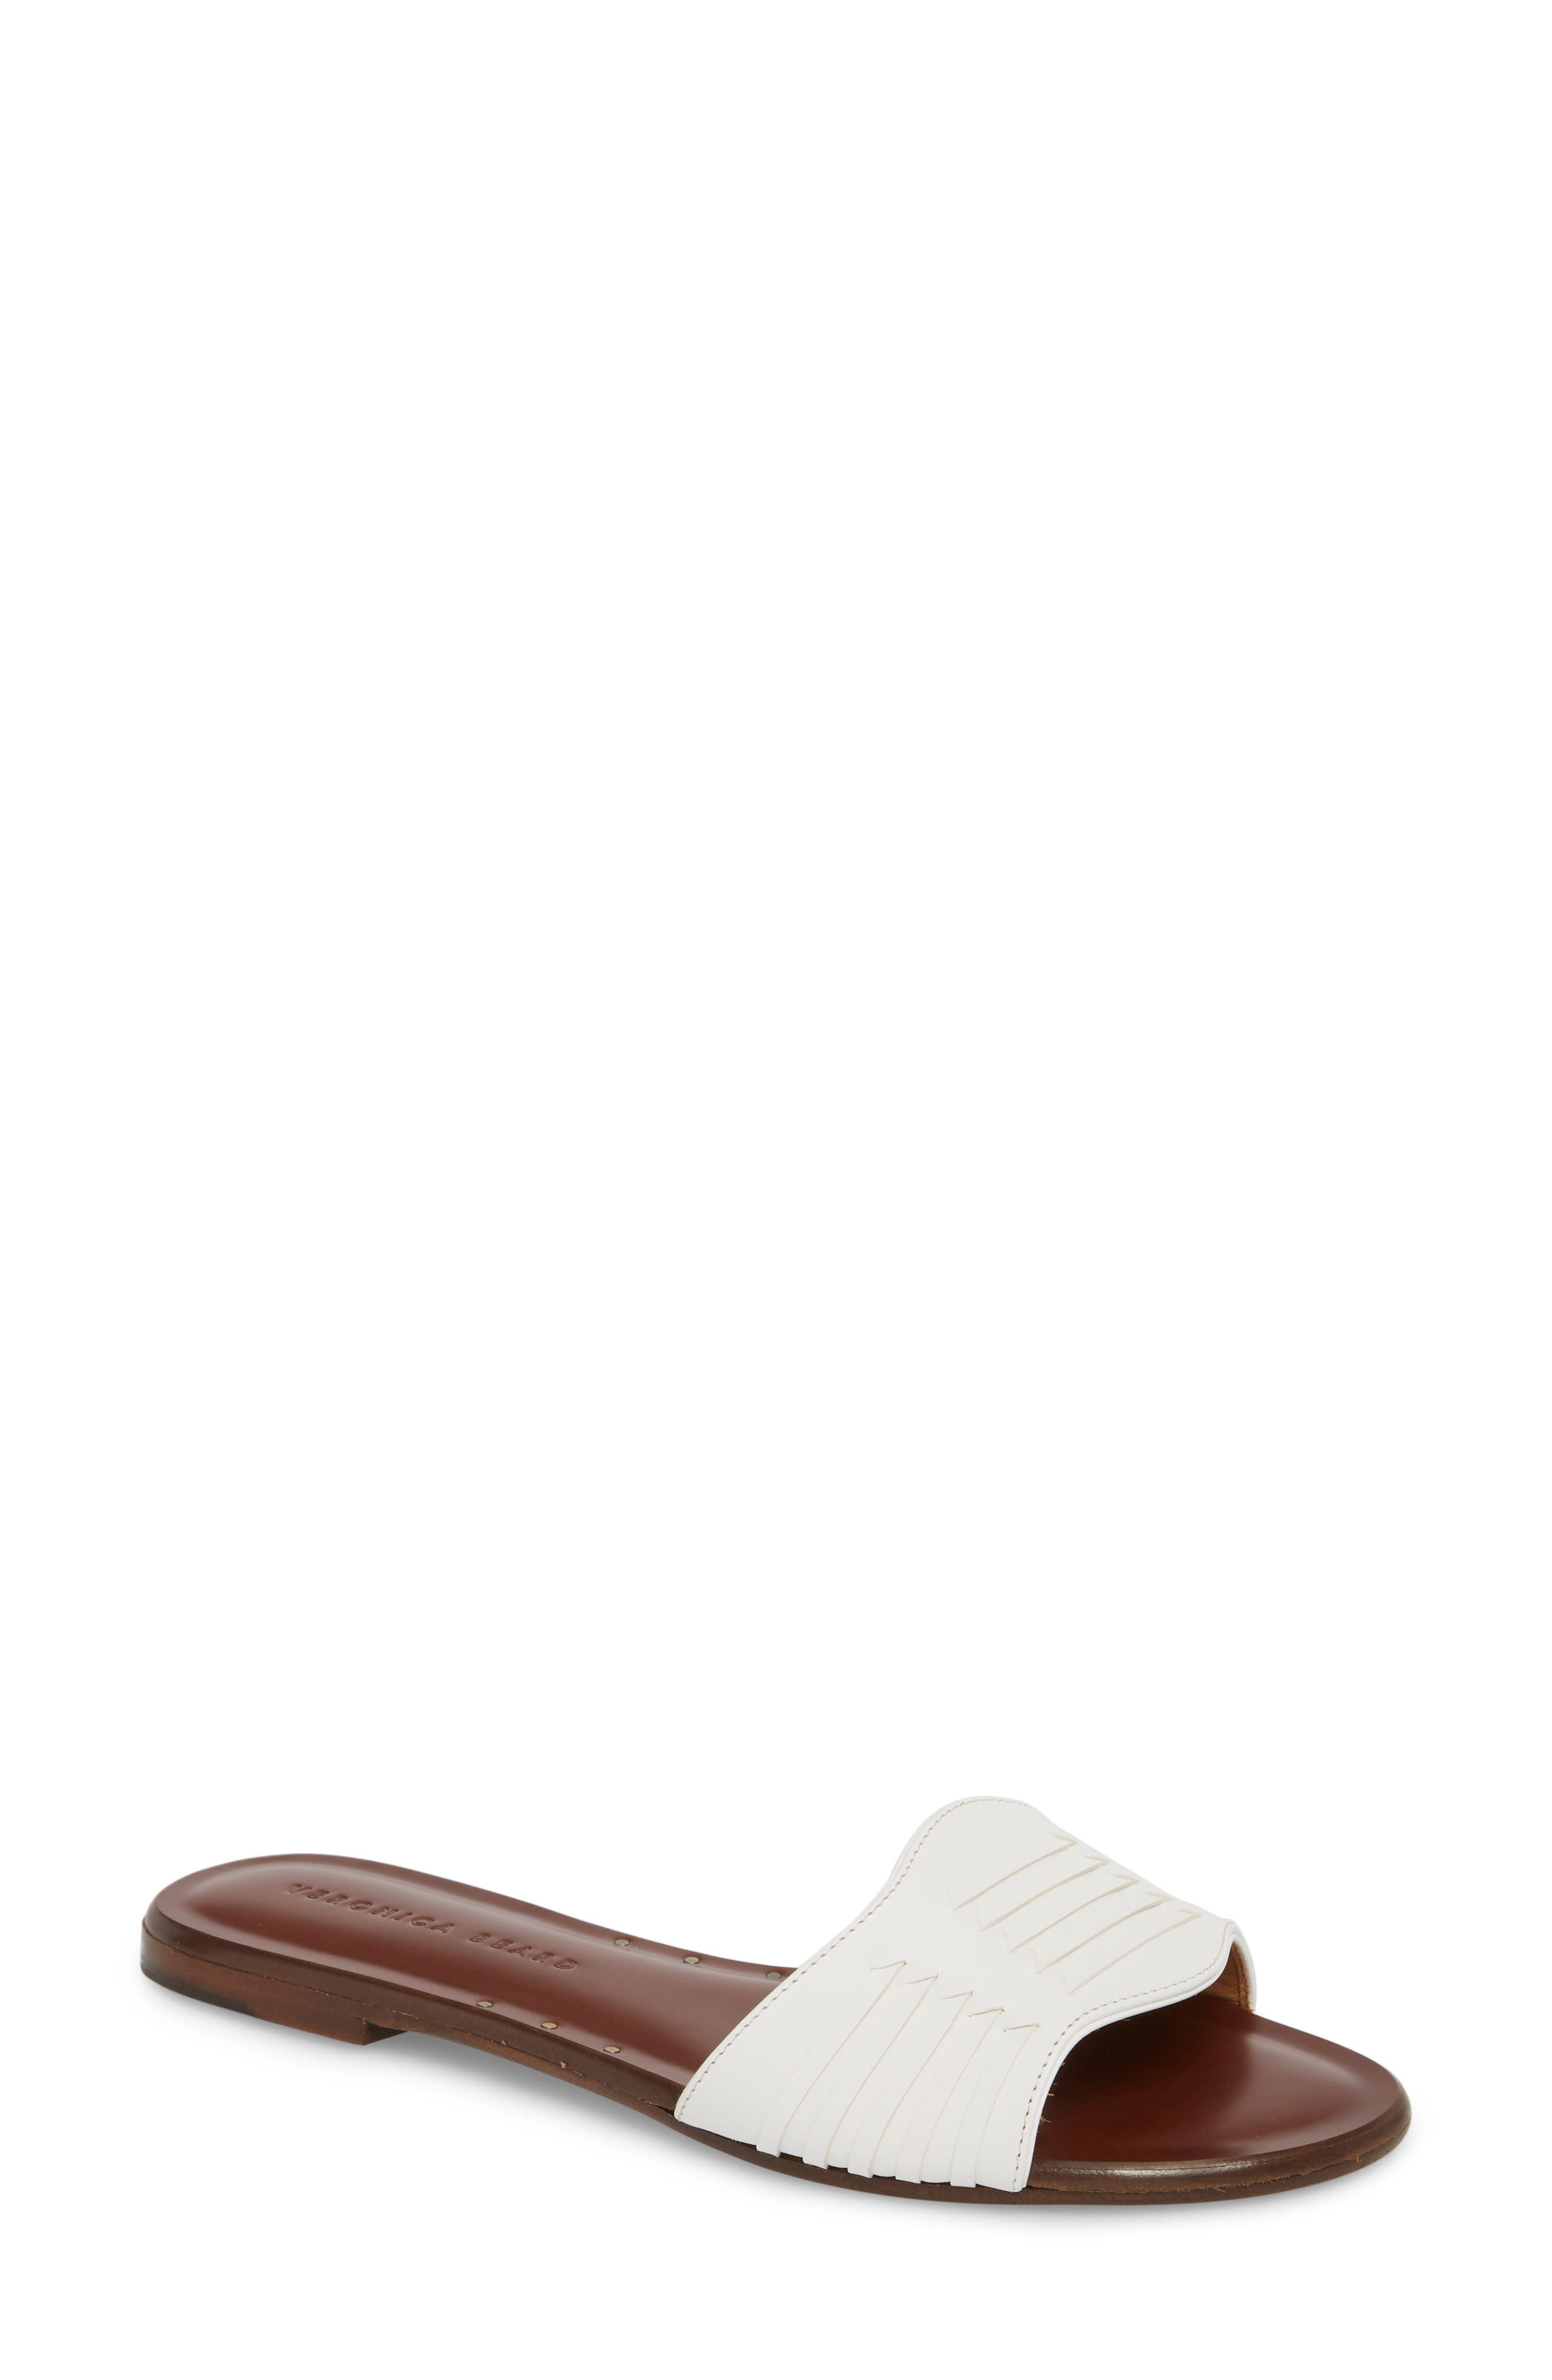 Faven Woven Slide Sandal,                             Main thumbnail 1, color,                             White